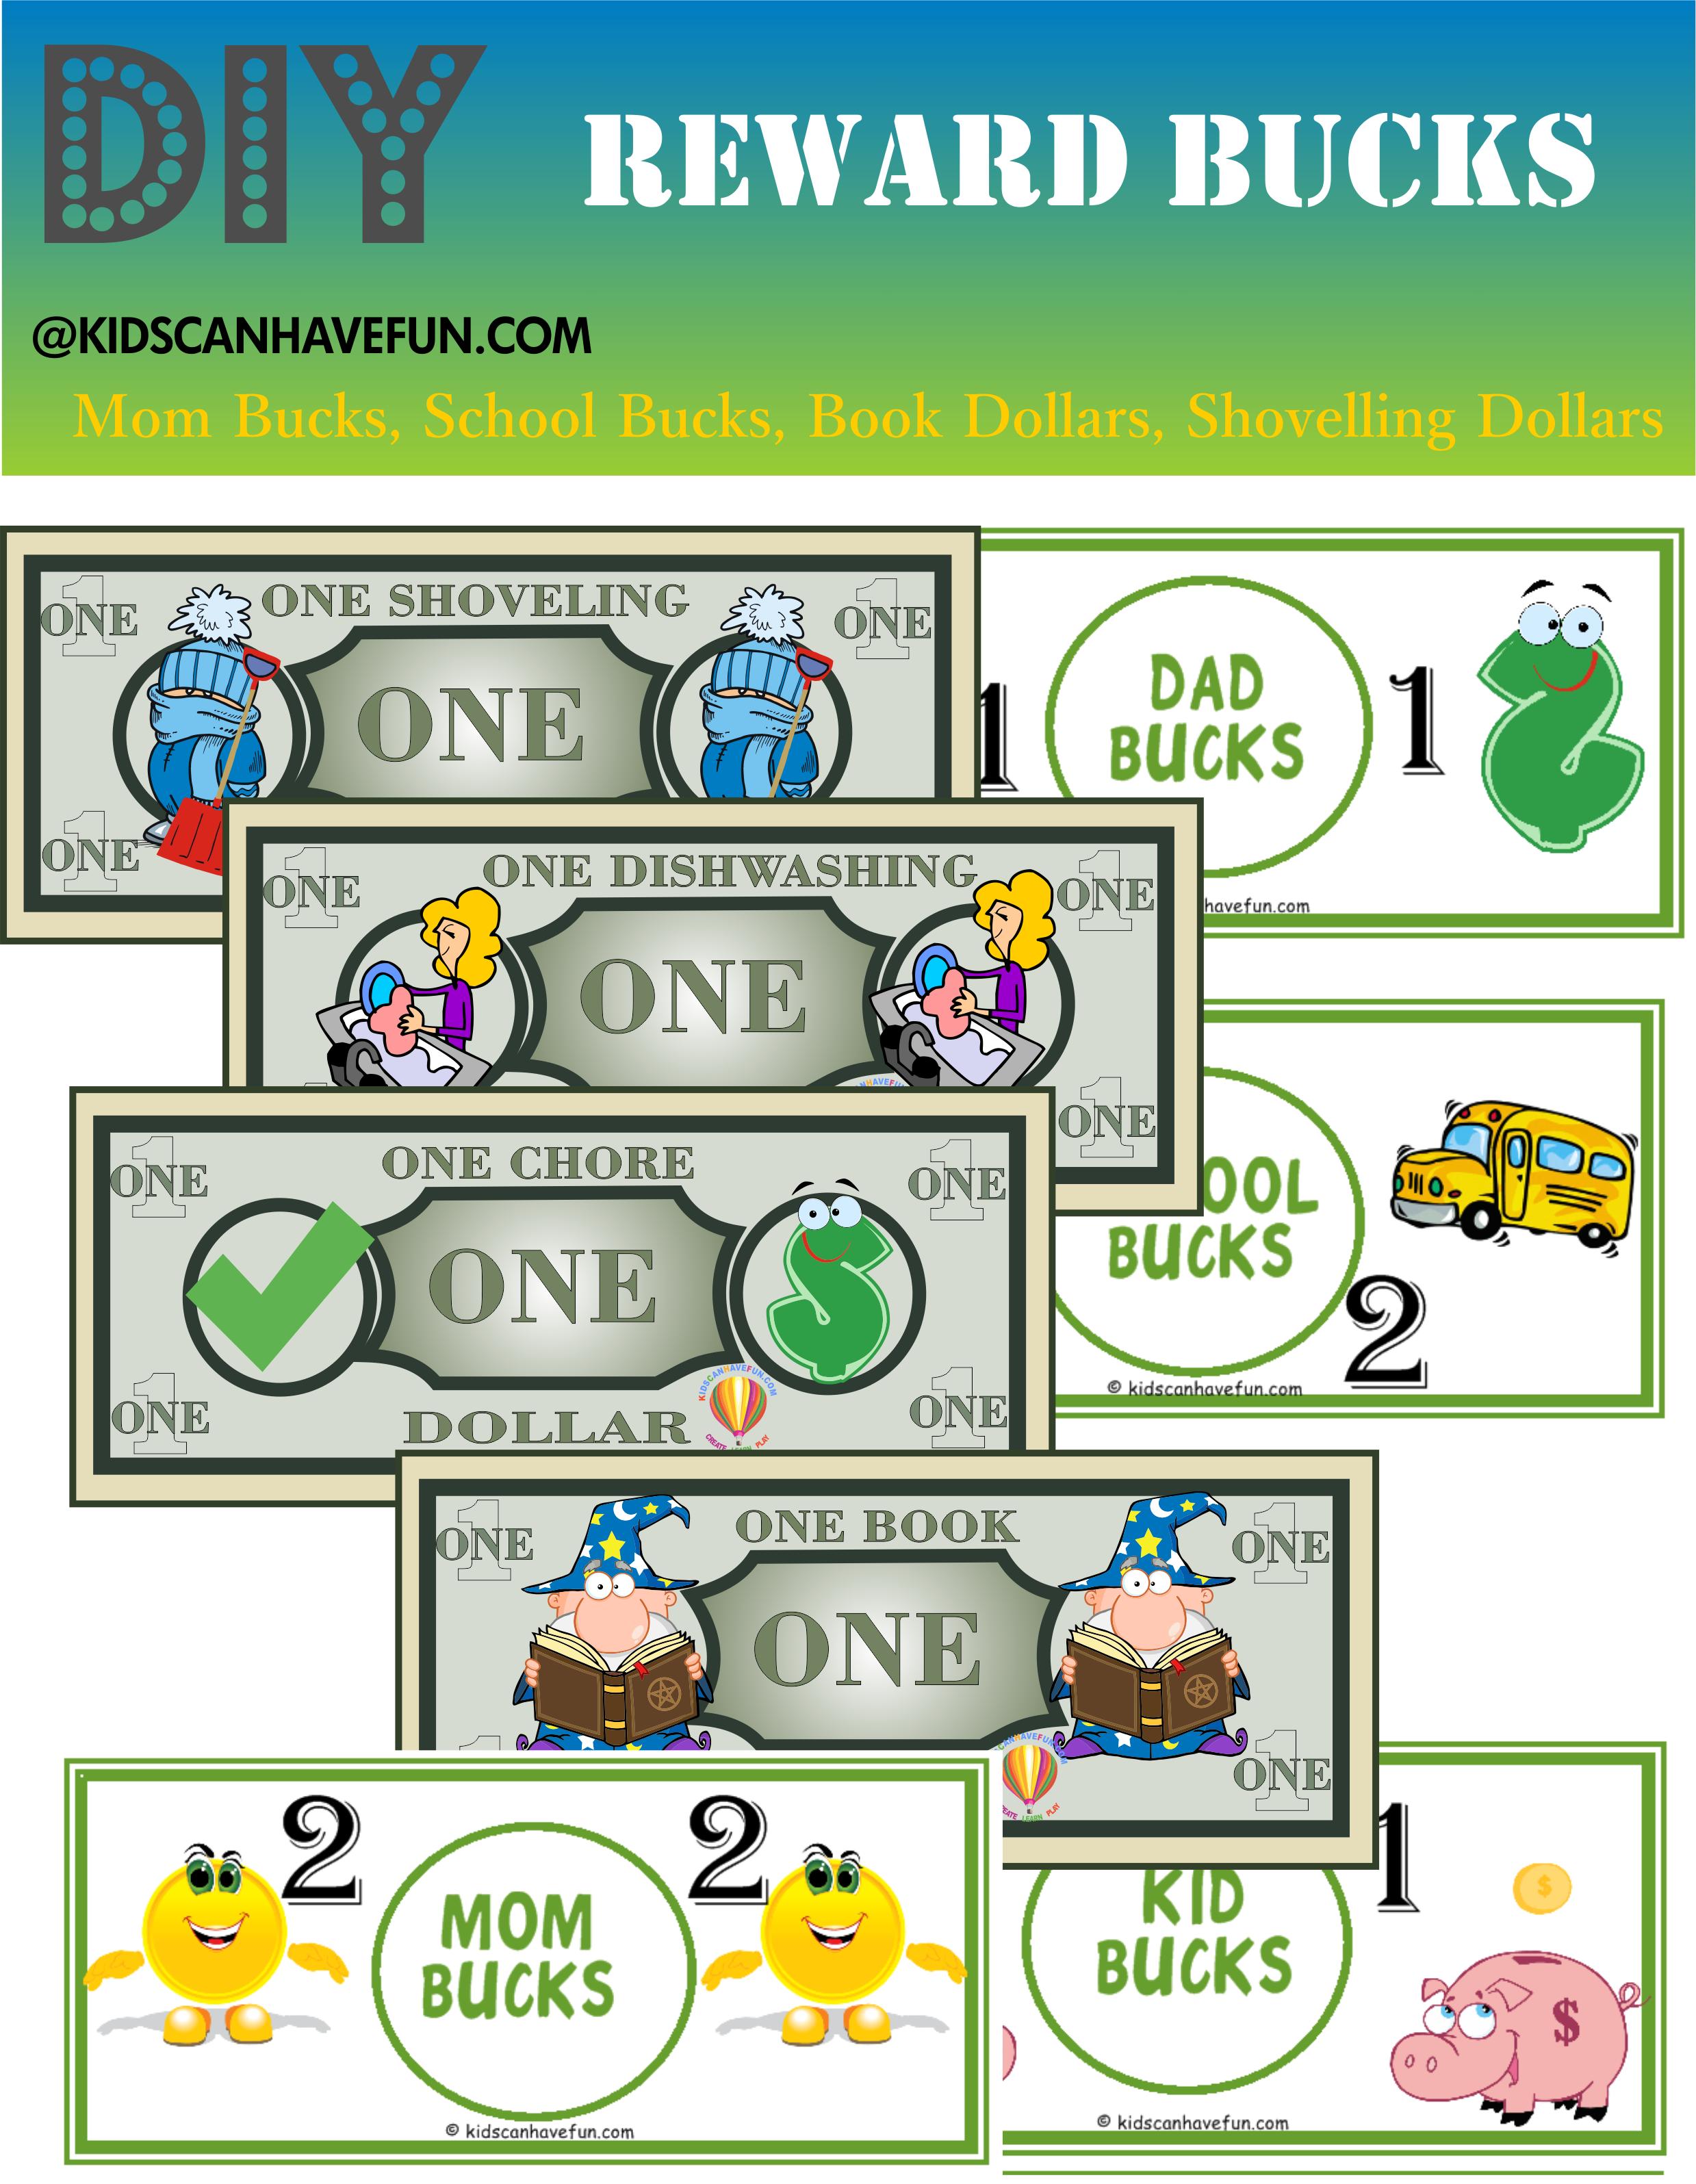 photo relating to Printable Reward Bucks named Benefit Pounds, Printable Exciting Economic